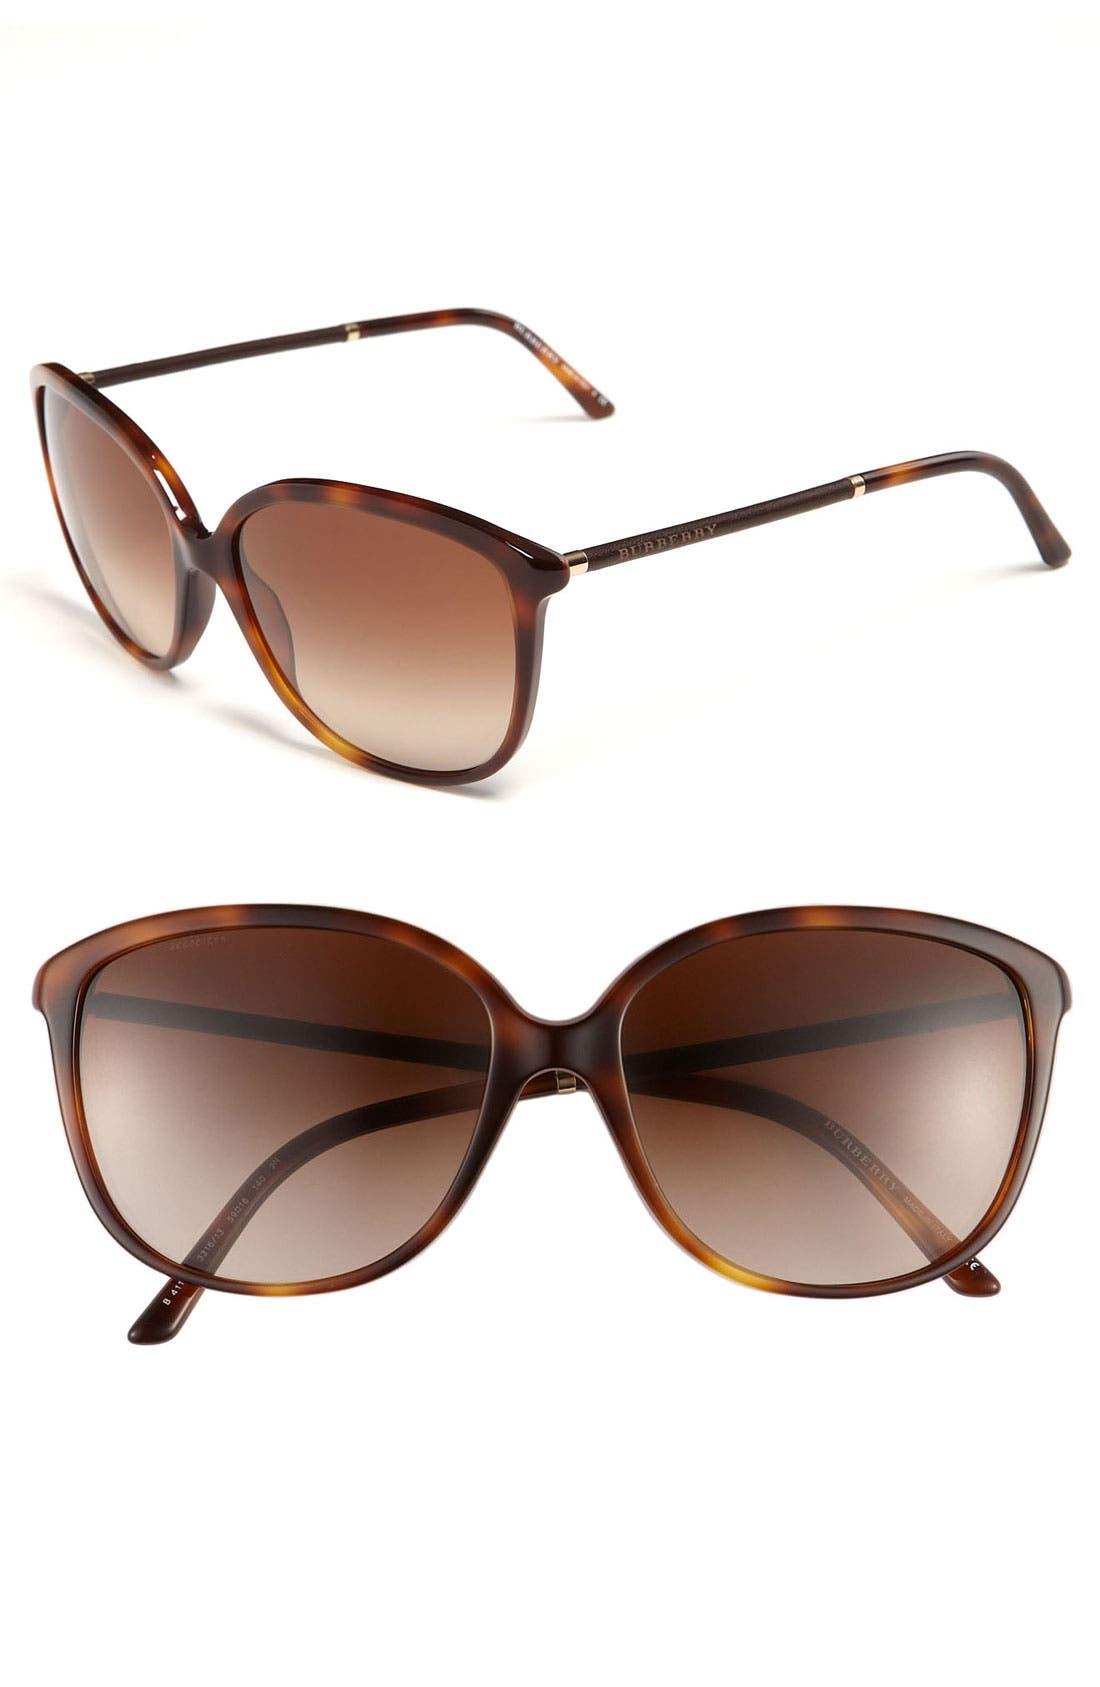 Main Image - Burberry 59mm Sunglasses